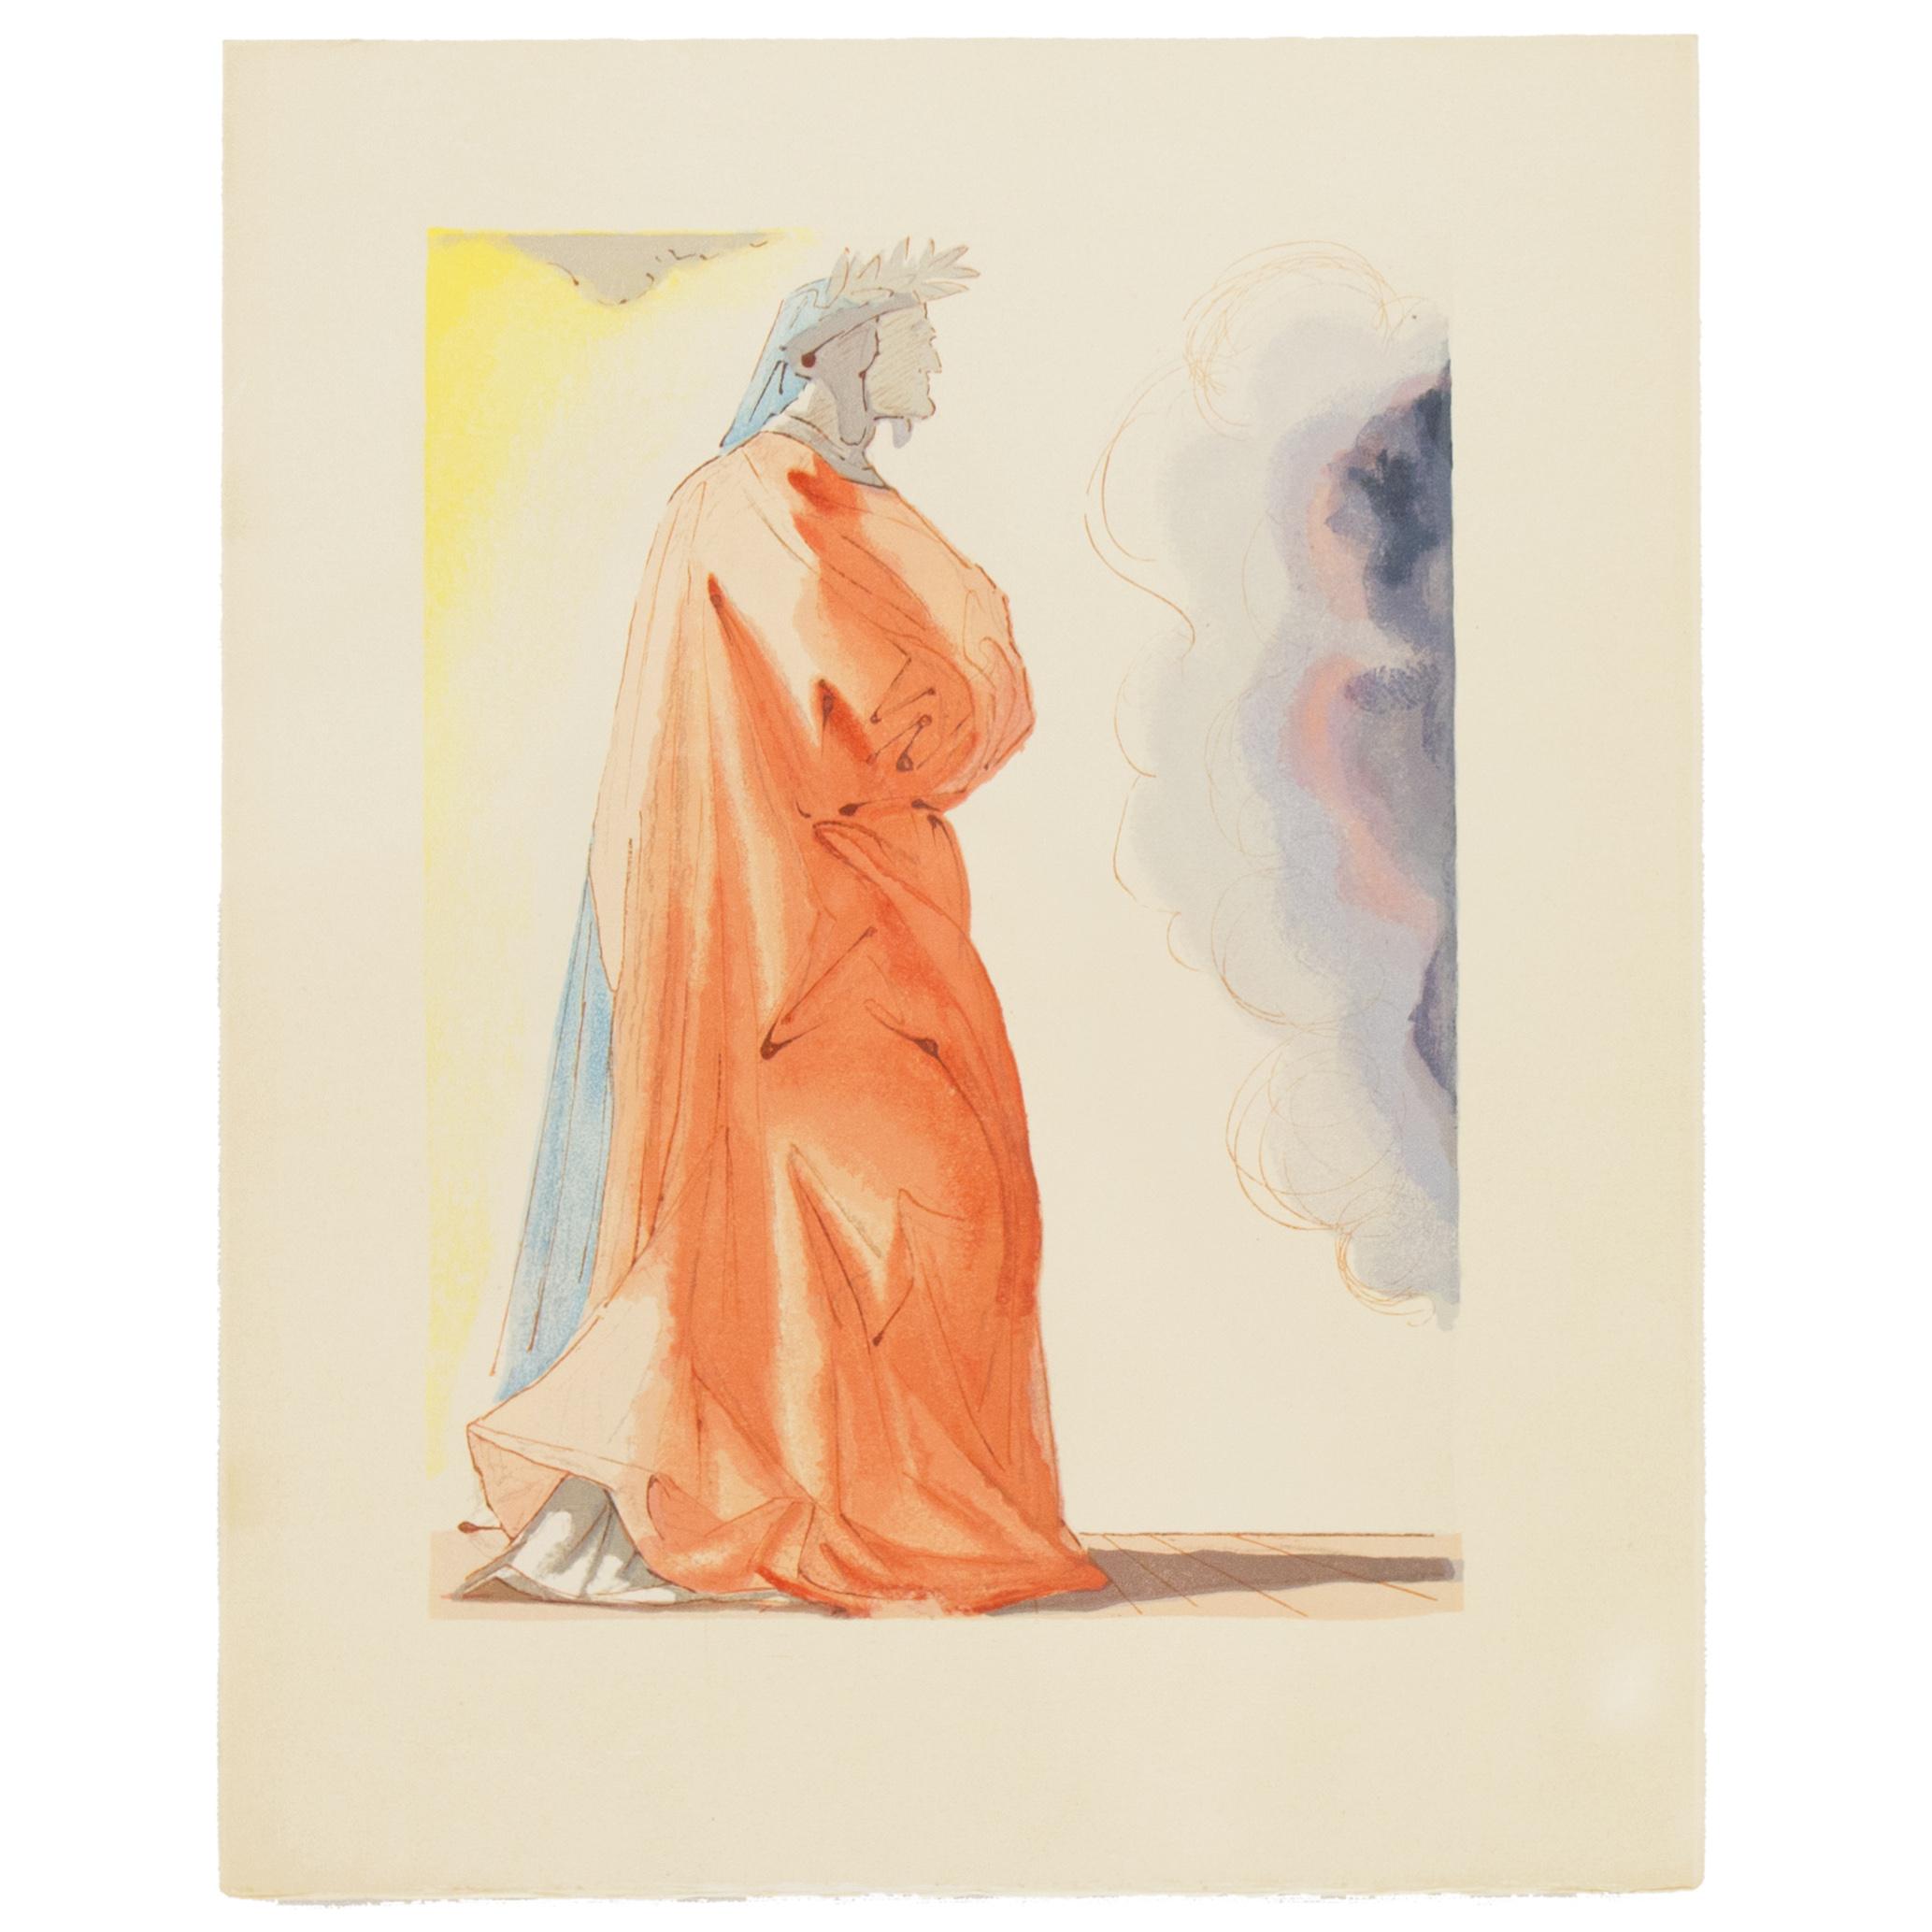 salvador-dali-dante-divine-comedy-paradise-1964-woodcut-unframed-art-group-projects.jpg